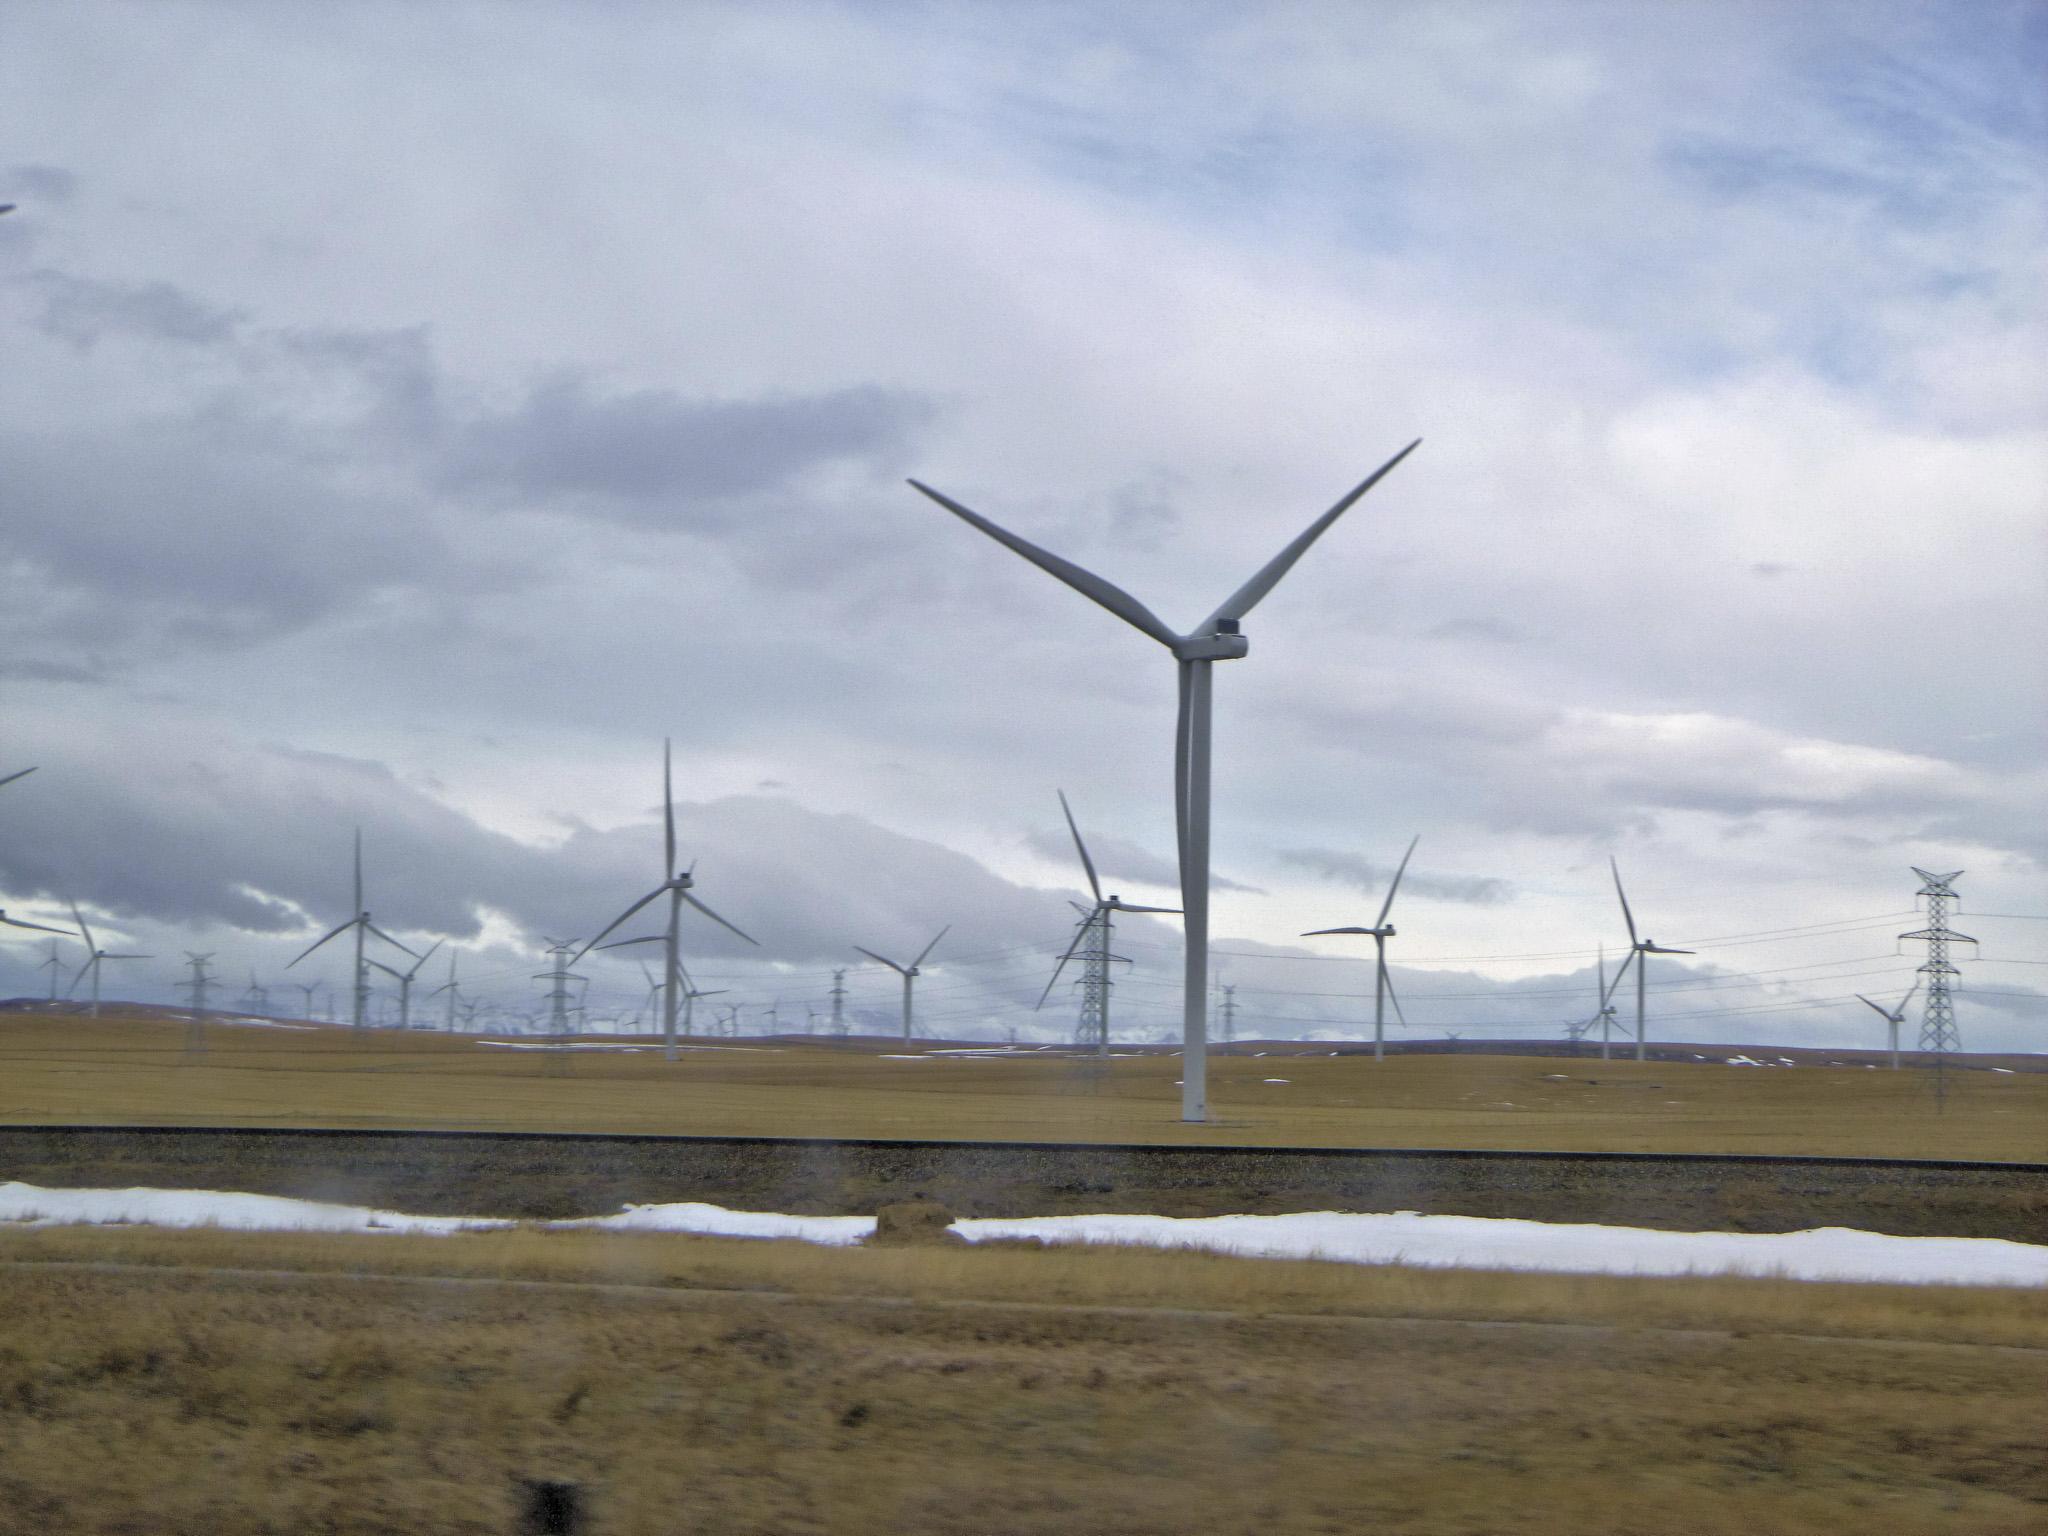 Doug Boyce - Wind Farm @ Pincher Creek AB